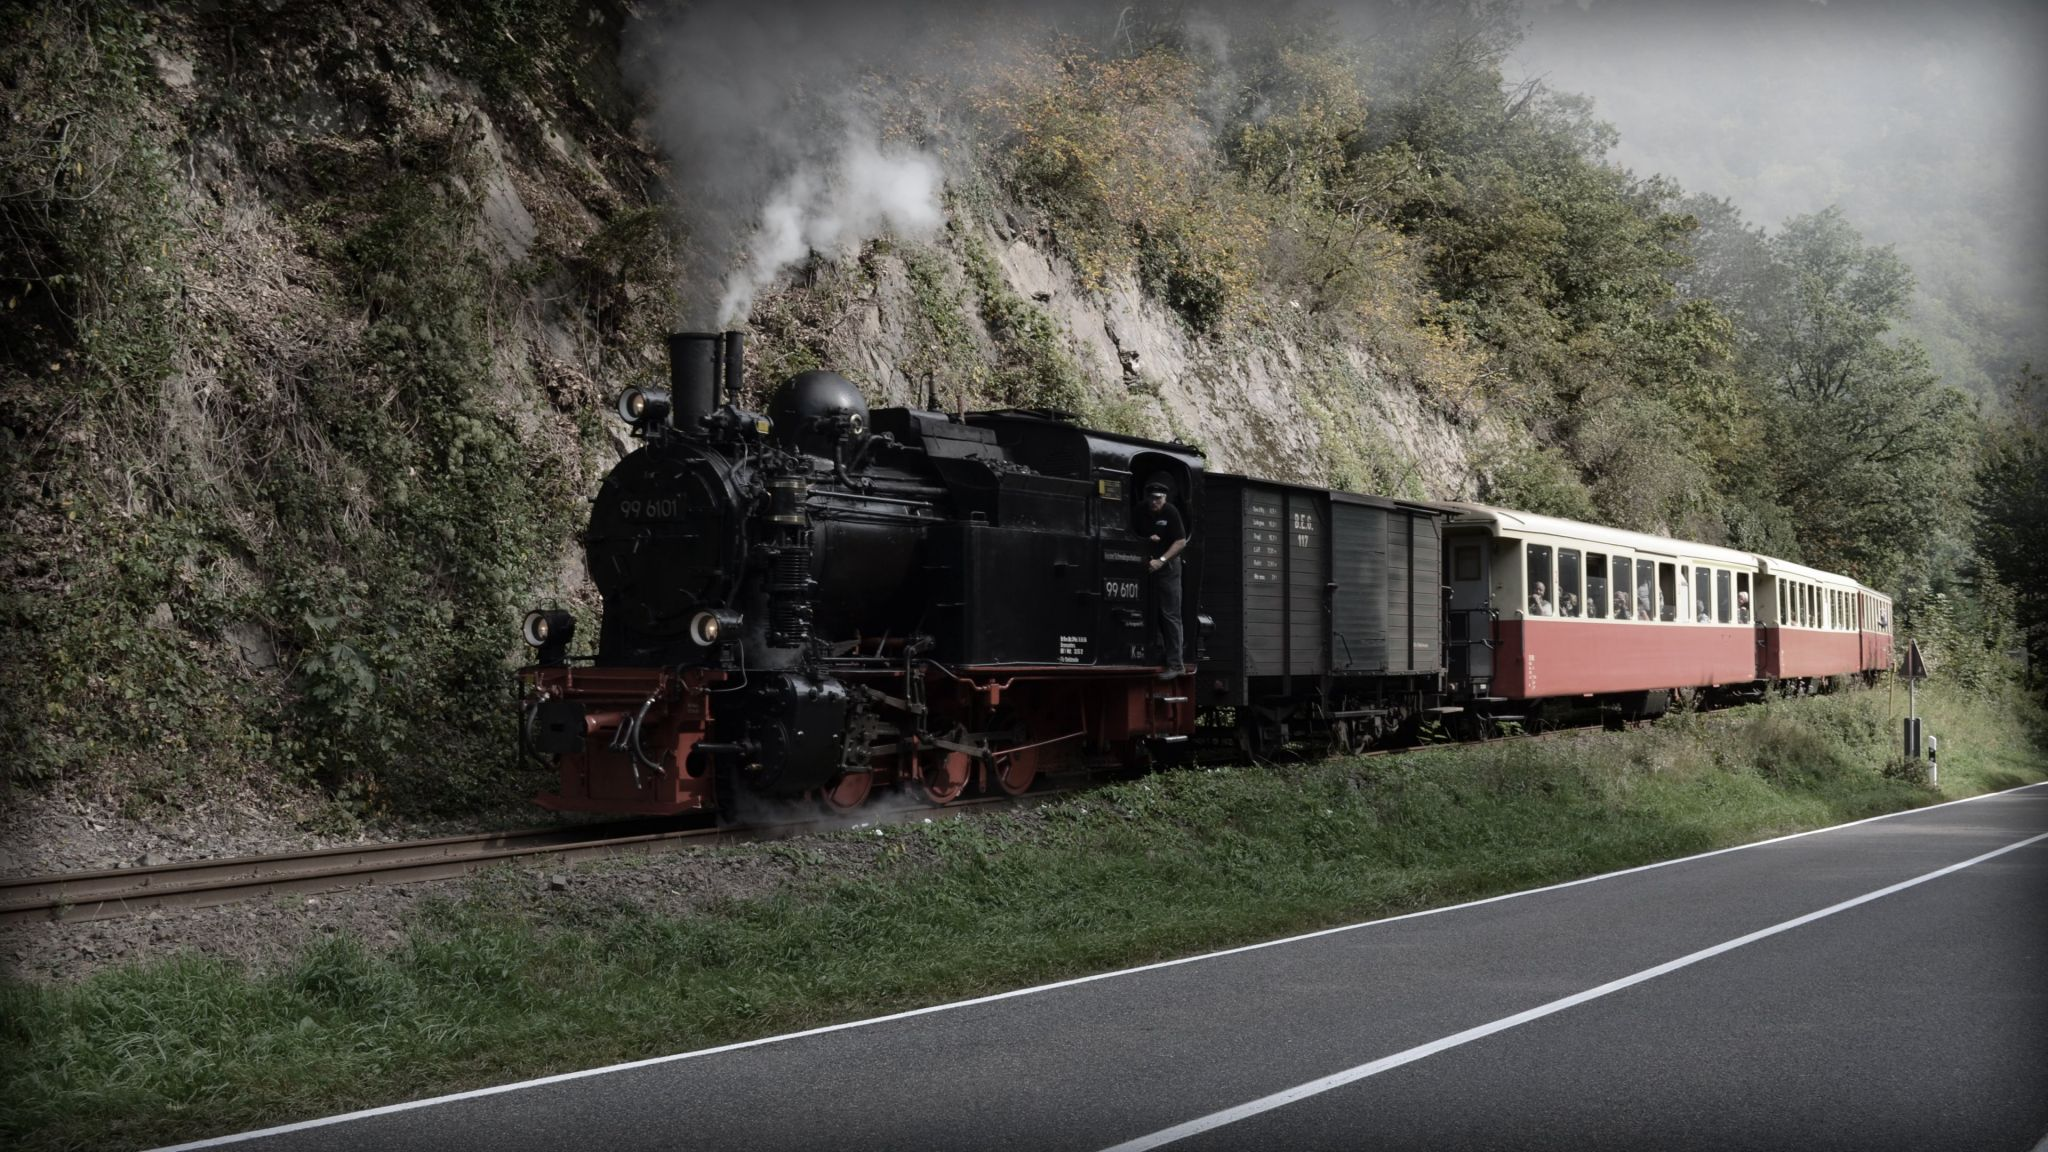 Vulkanexpress, Germany